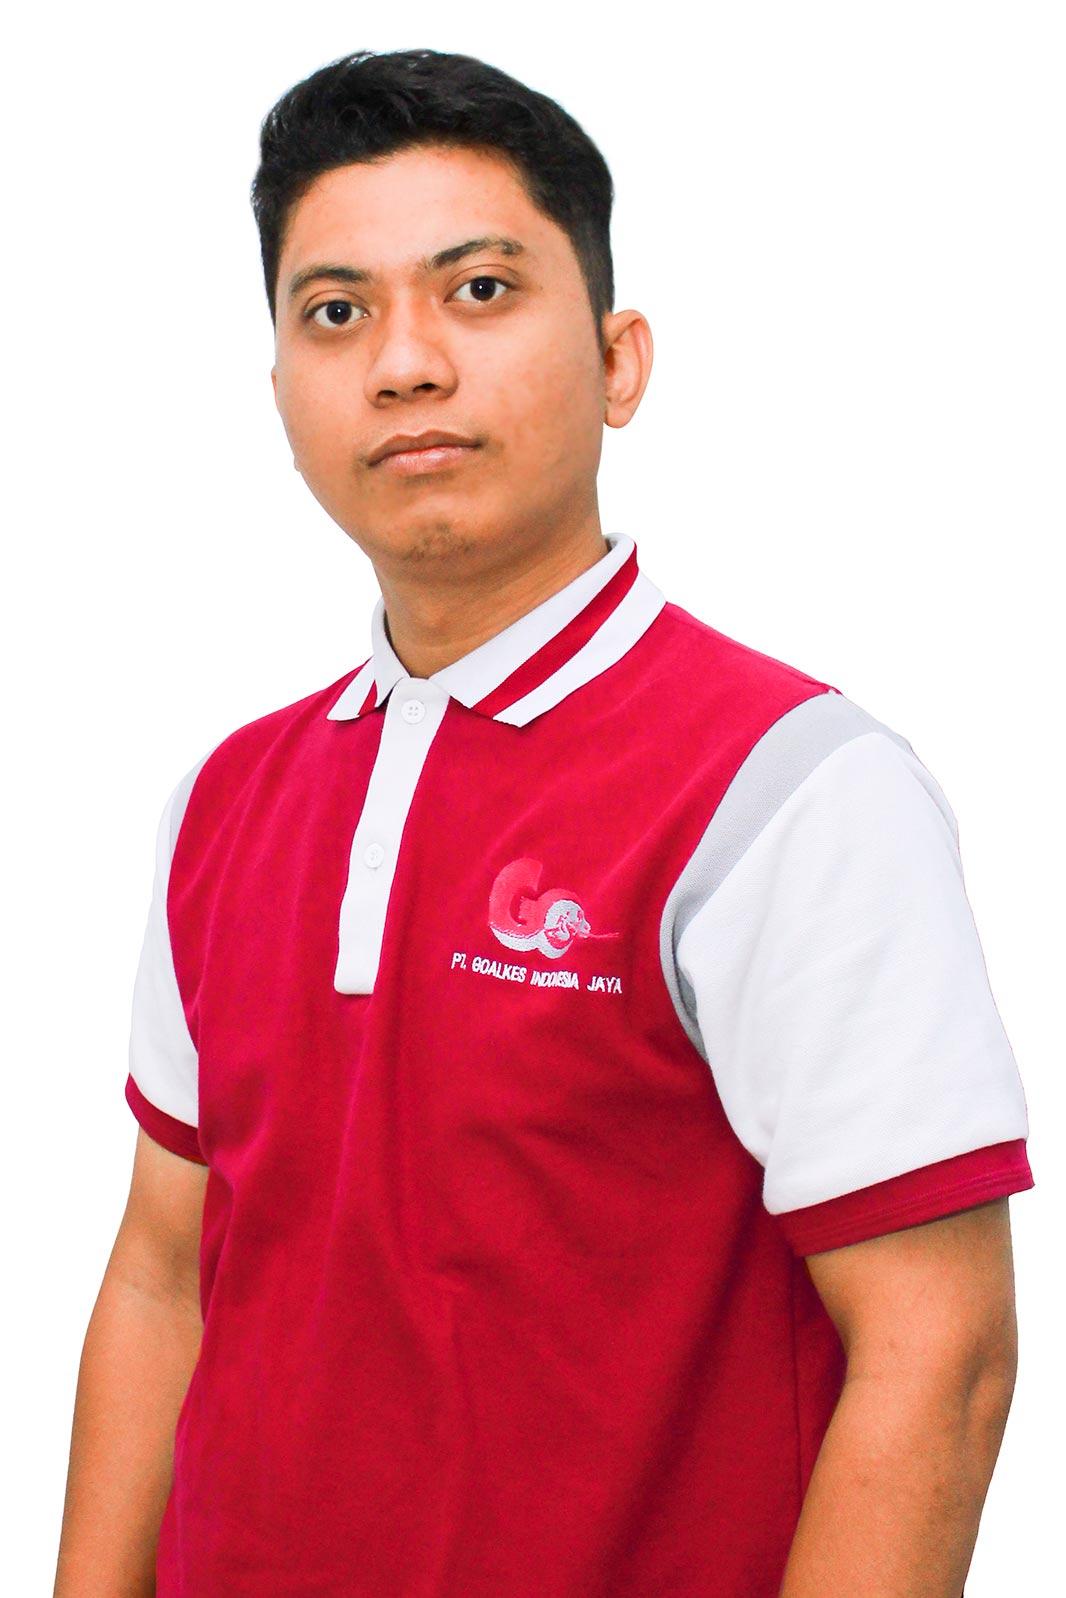 Asmardin Nasution